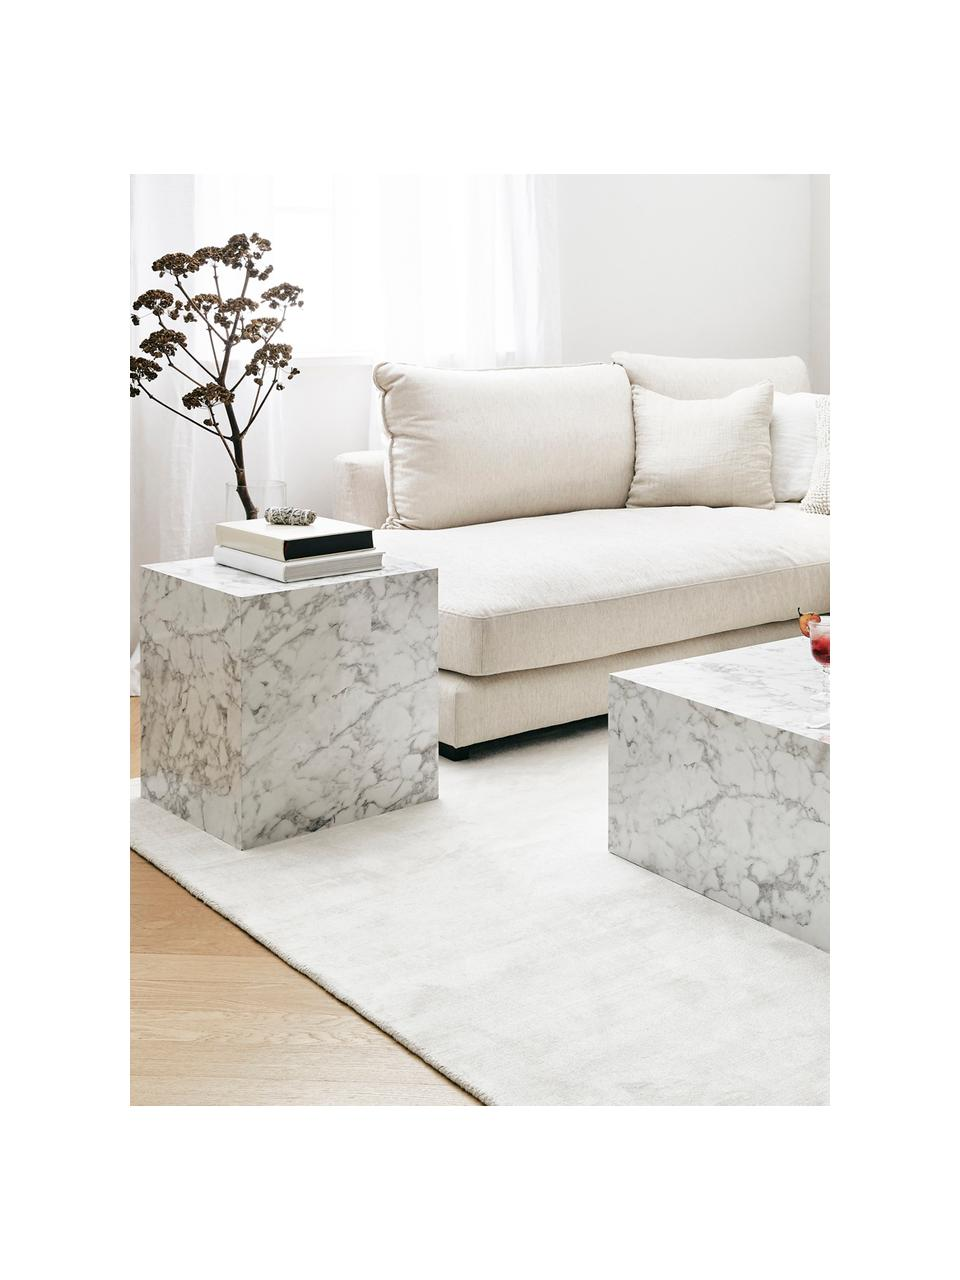 Table d'appoint aspect marbre Lesley, Blanc, aspect marbre